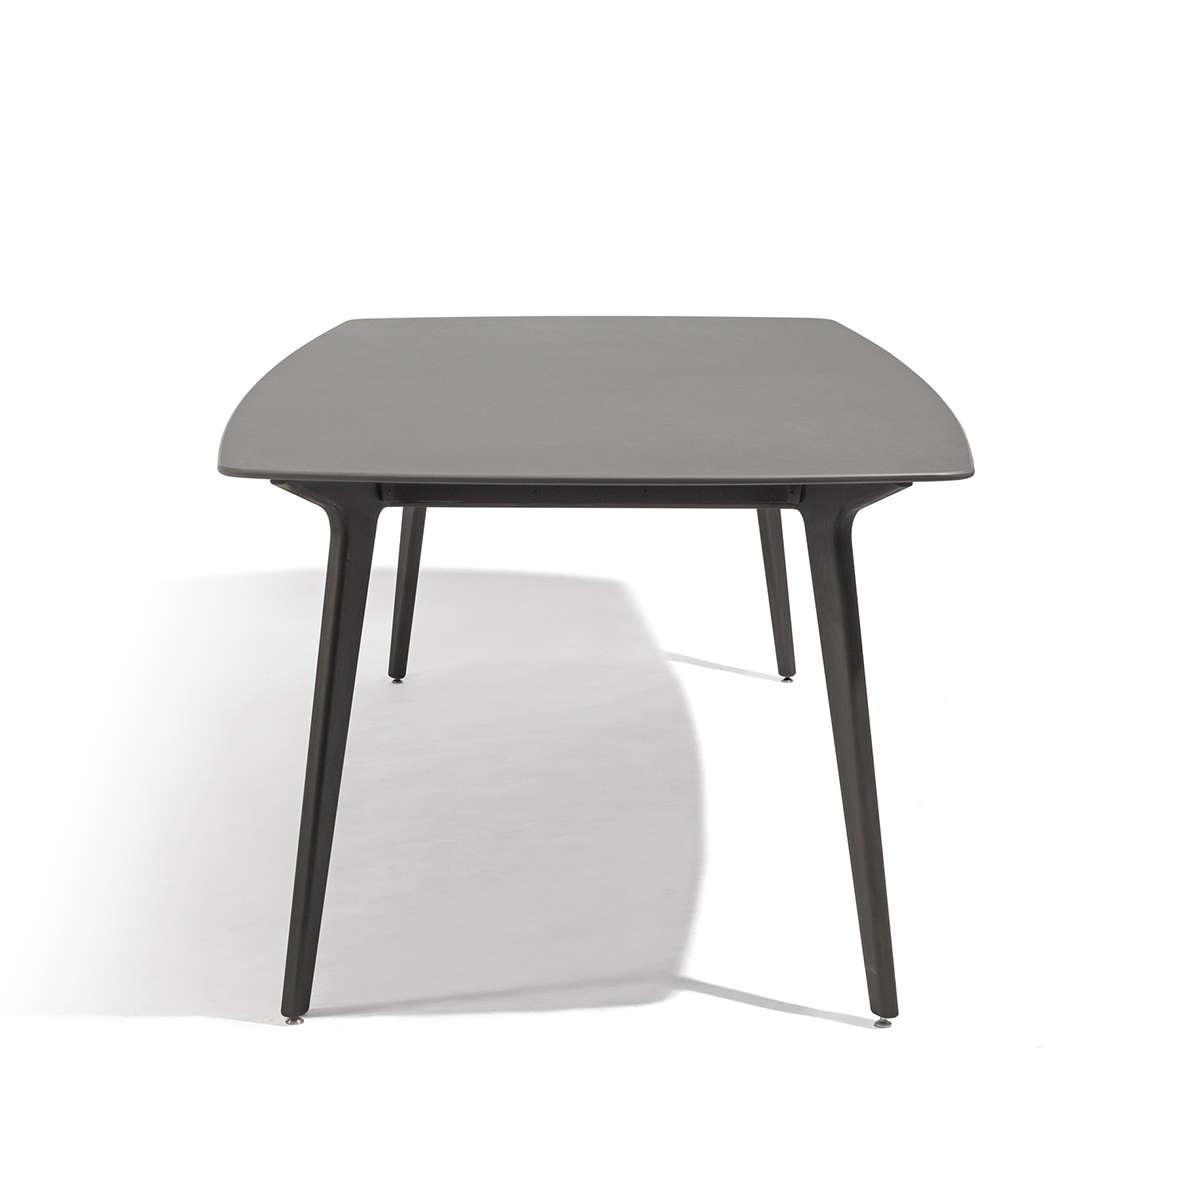 Manutti Torsa Dining Table Cut Out 5